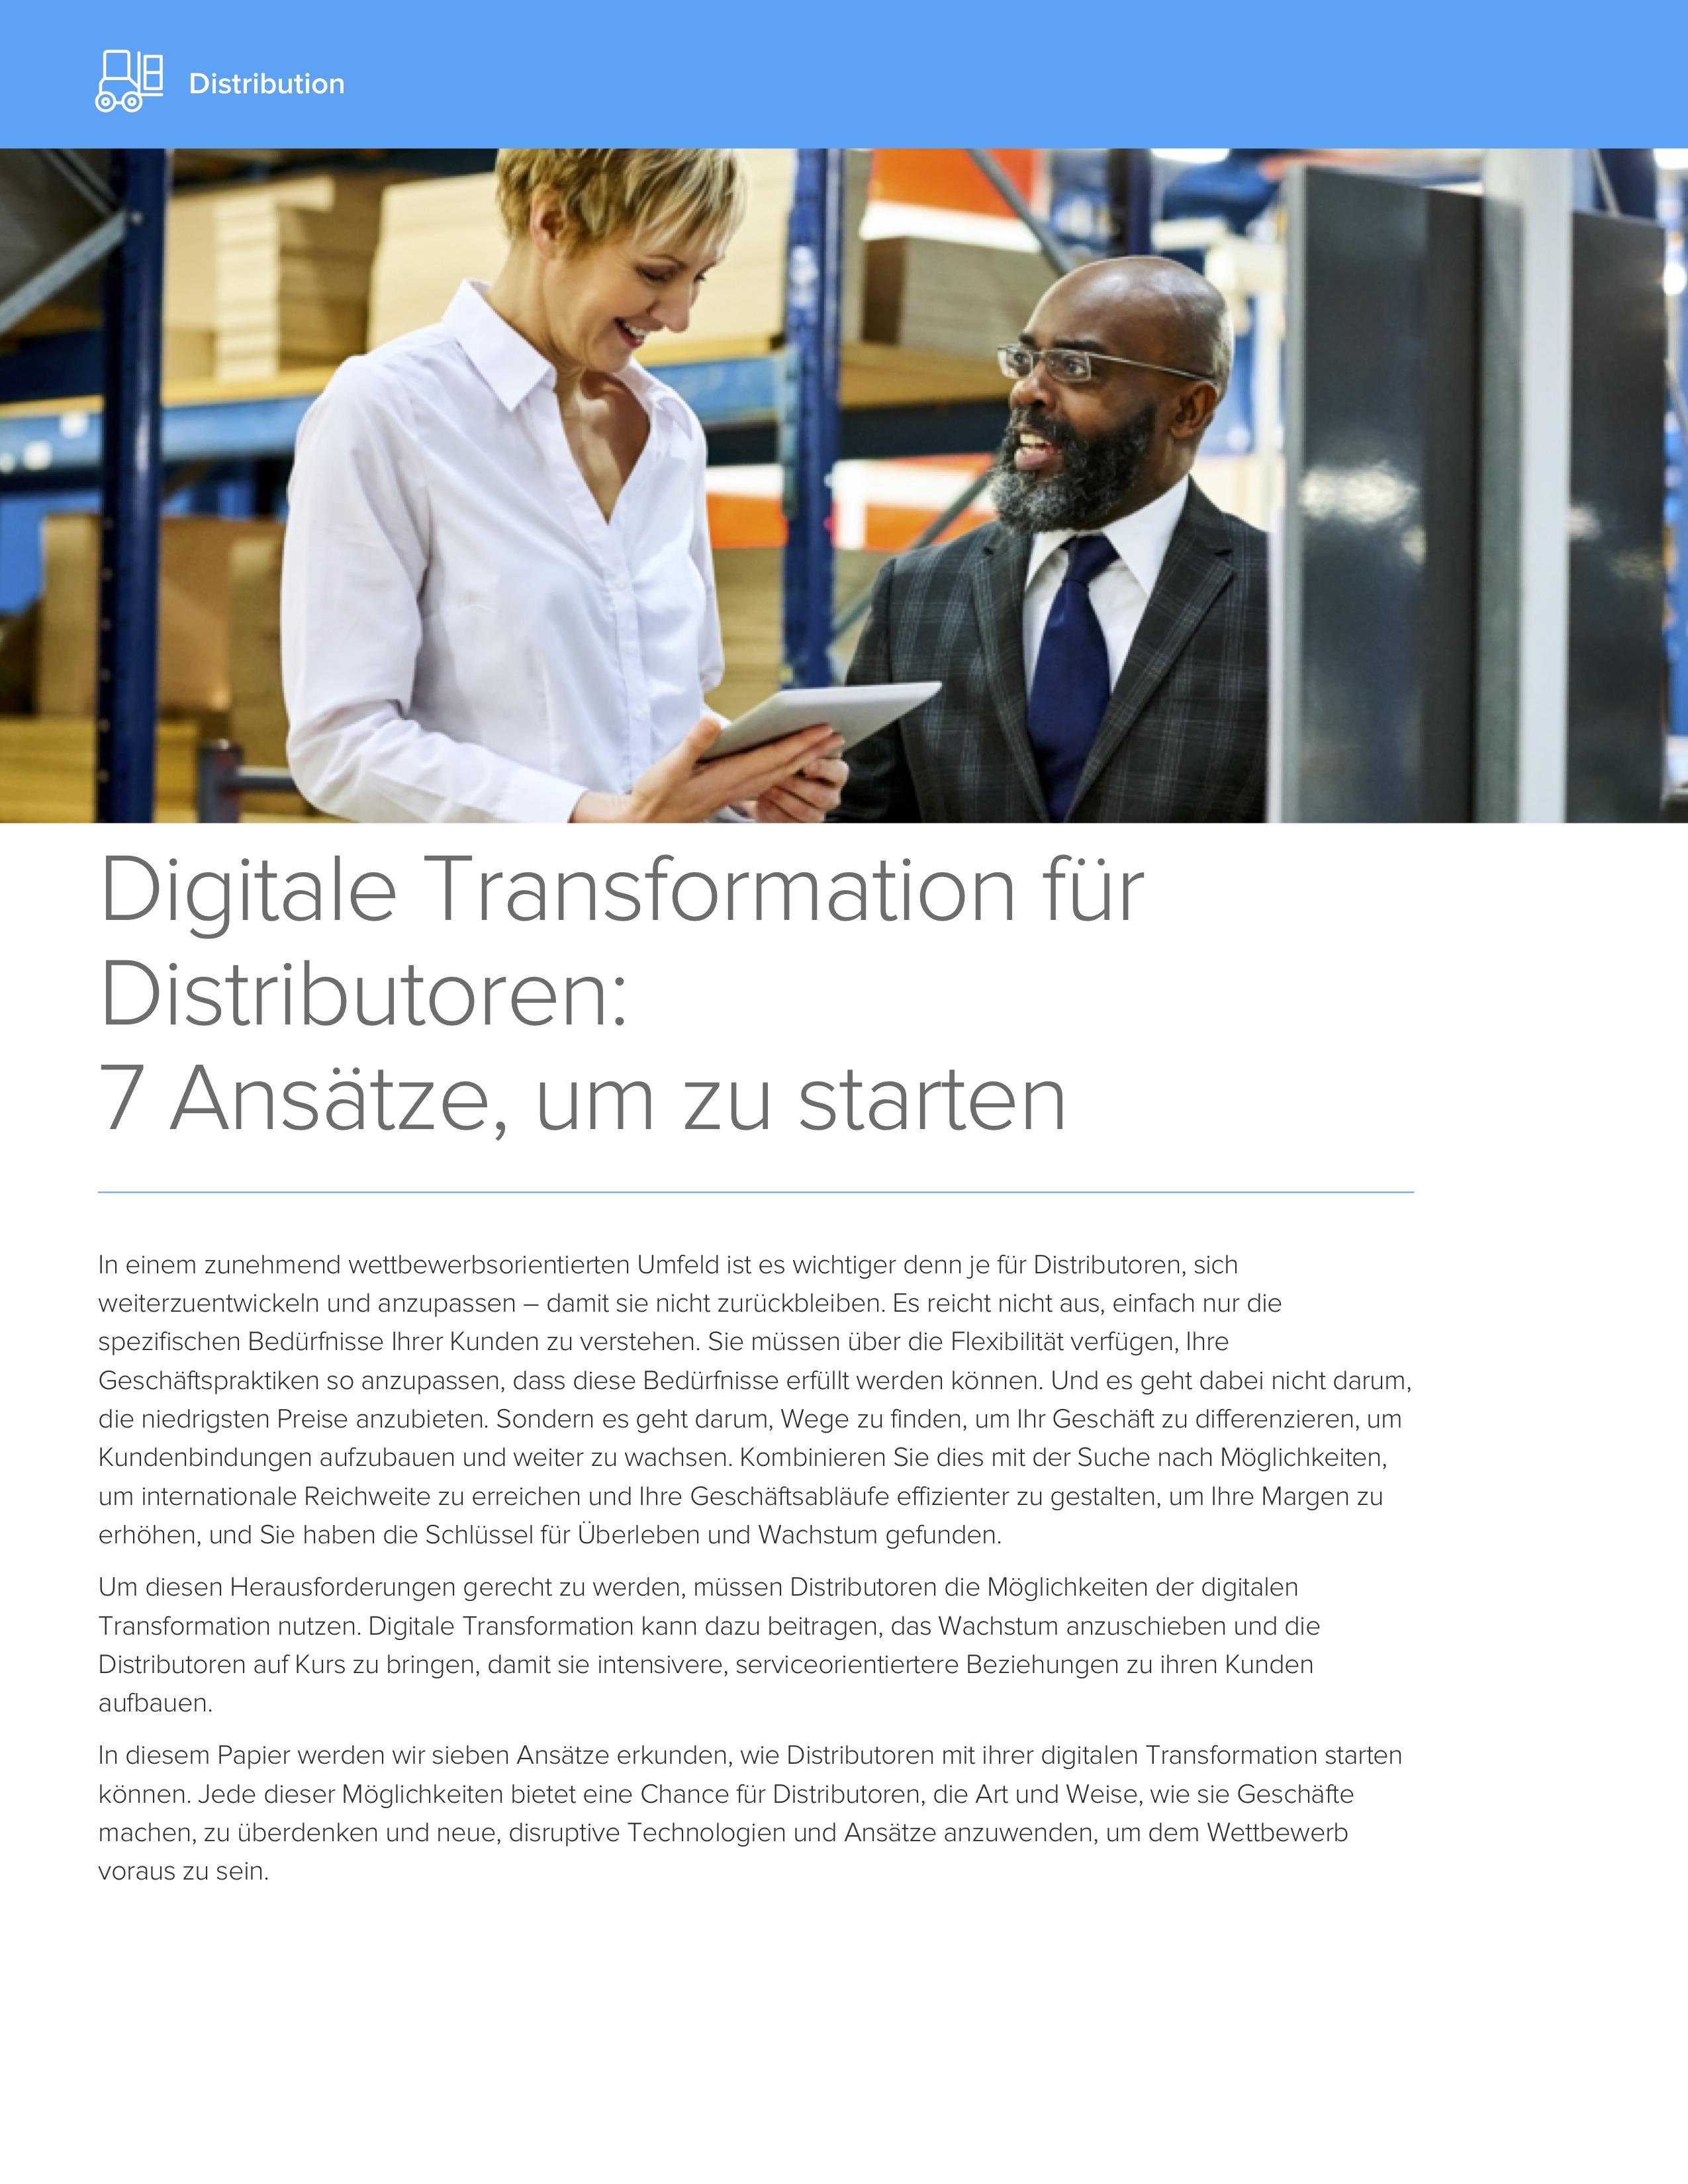 Digitale transformation fu%cc%88r distributorencover